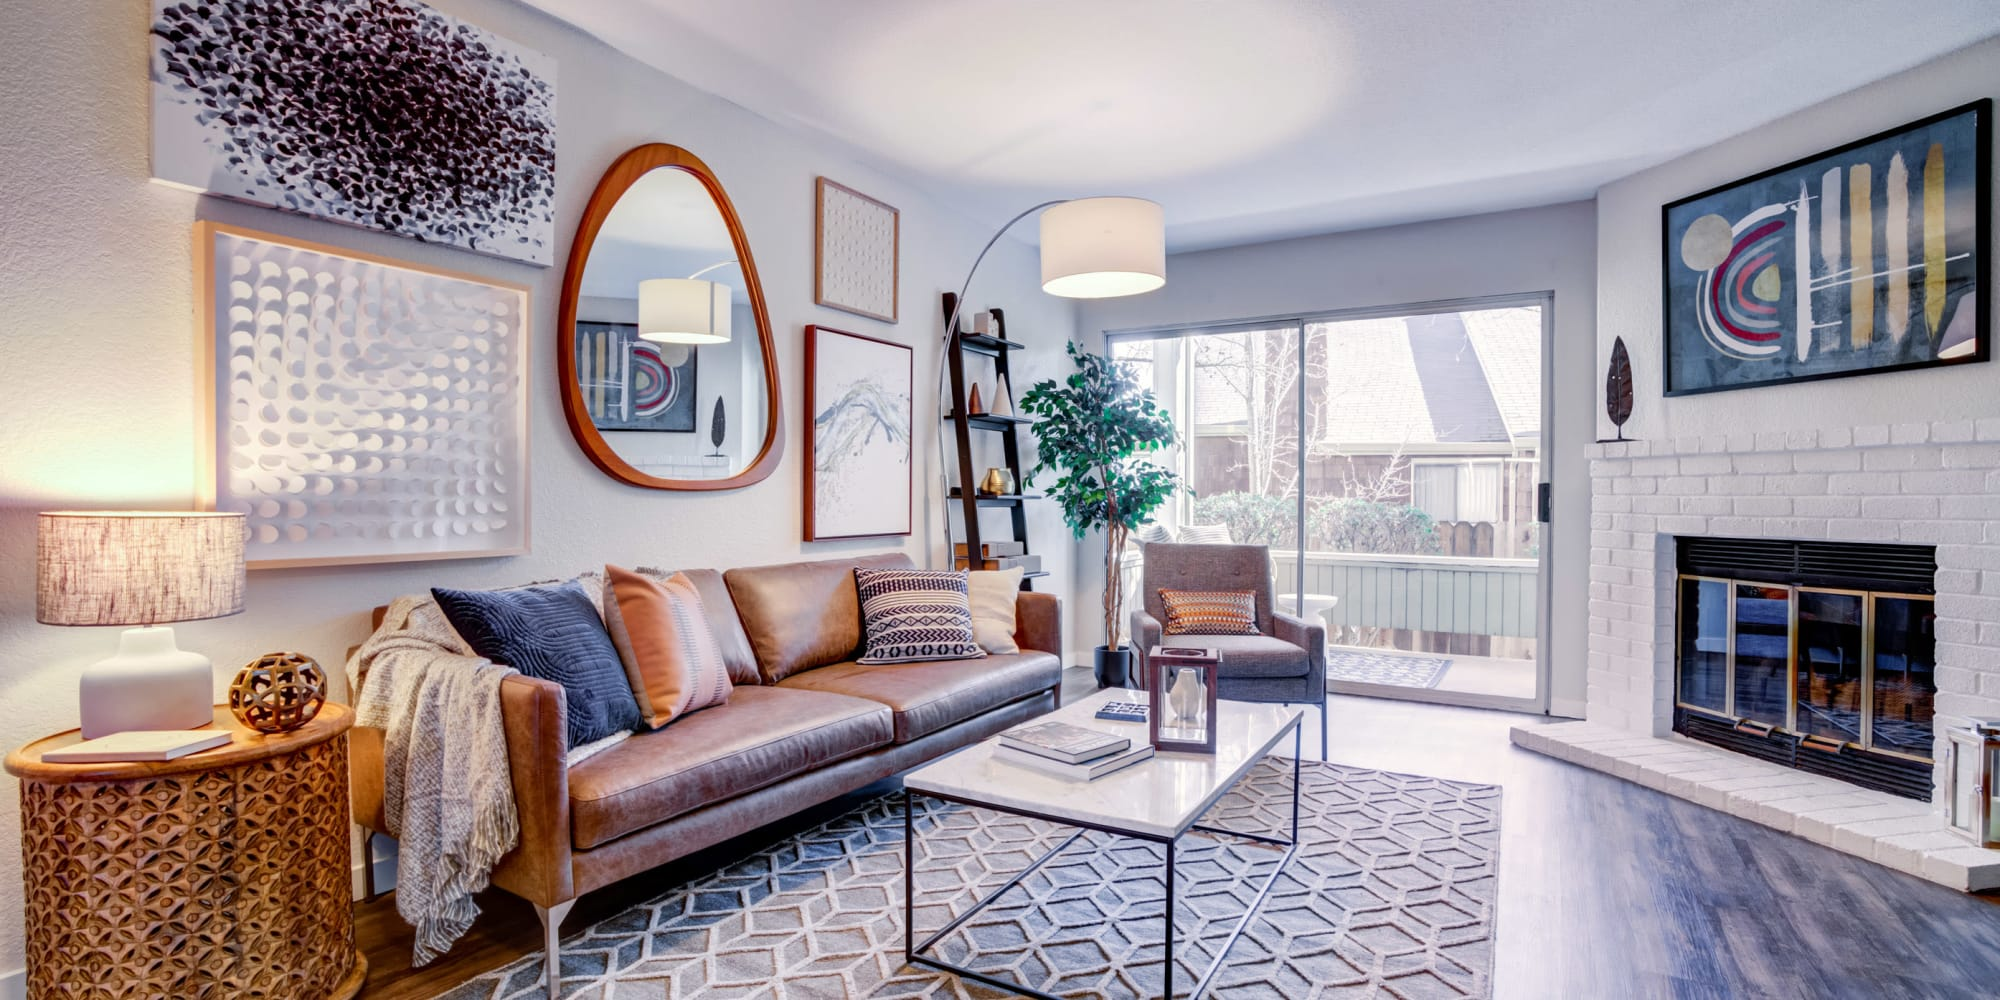 Apartments in Martinez, California, at Haven Martinez